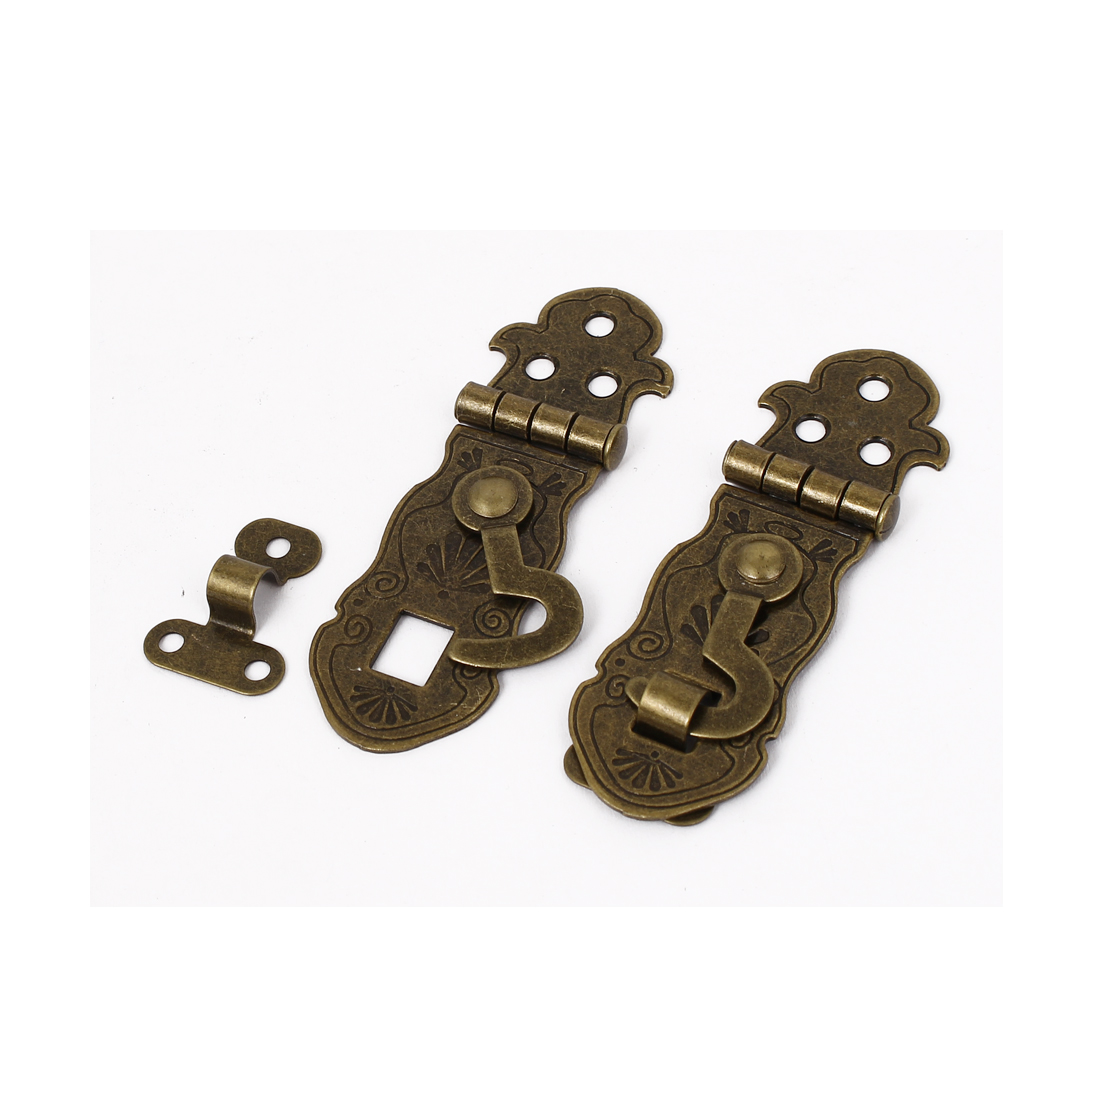 Antique Style Suitcase Lock Chest Box Clasp Hasp Latch Bronze Tone 2pcs